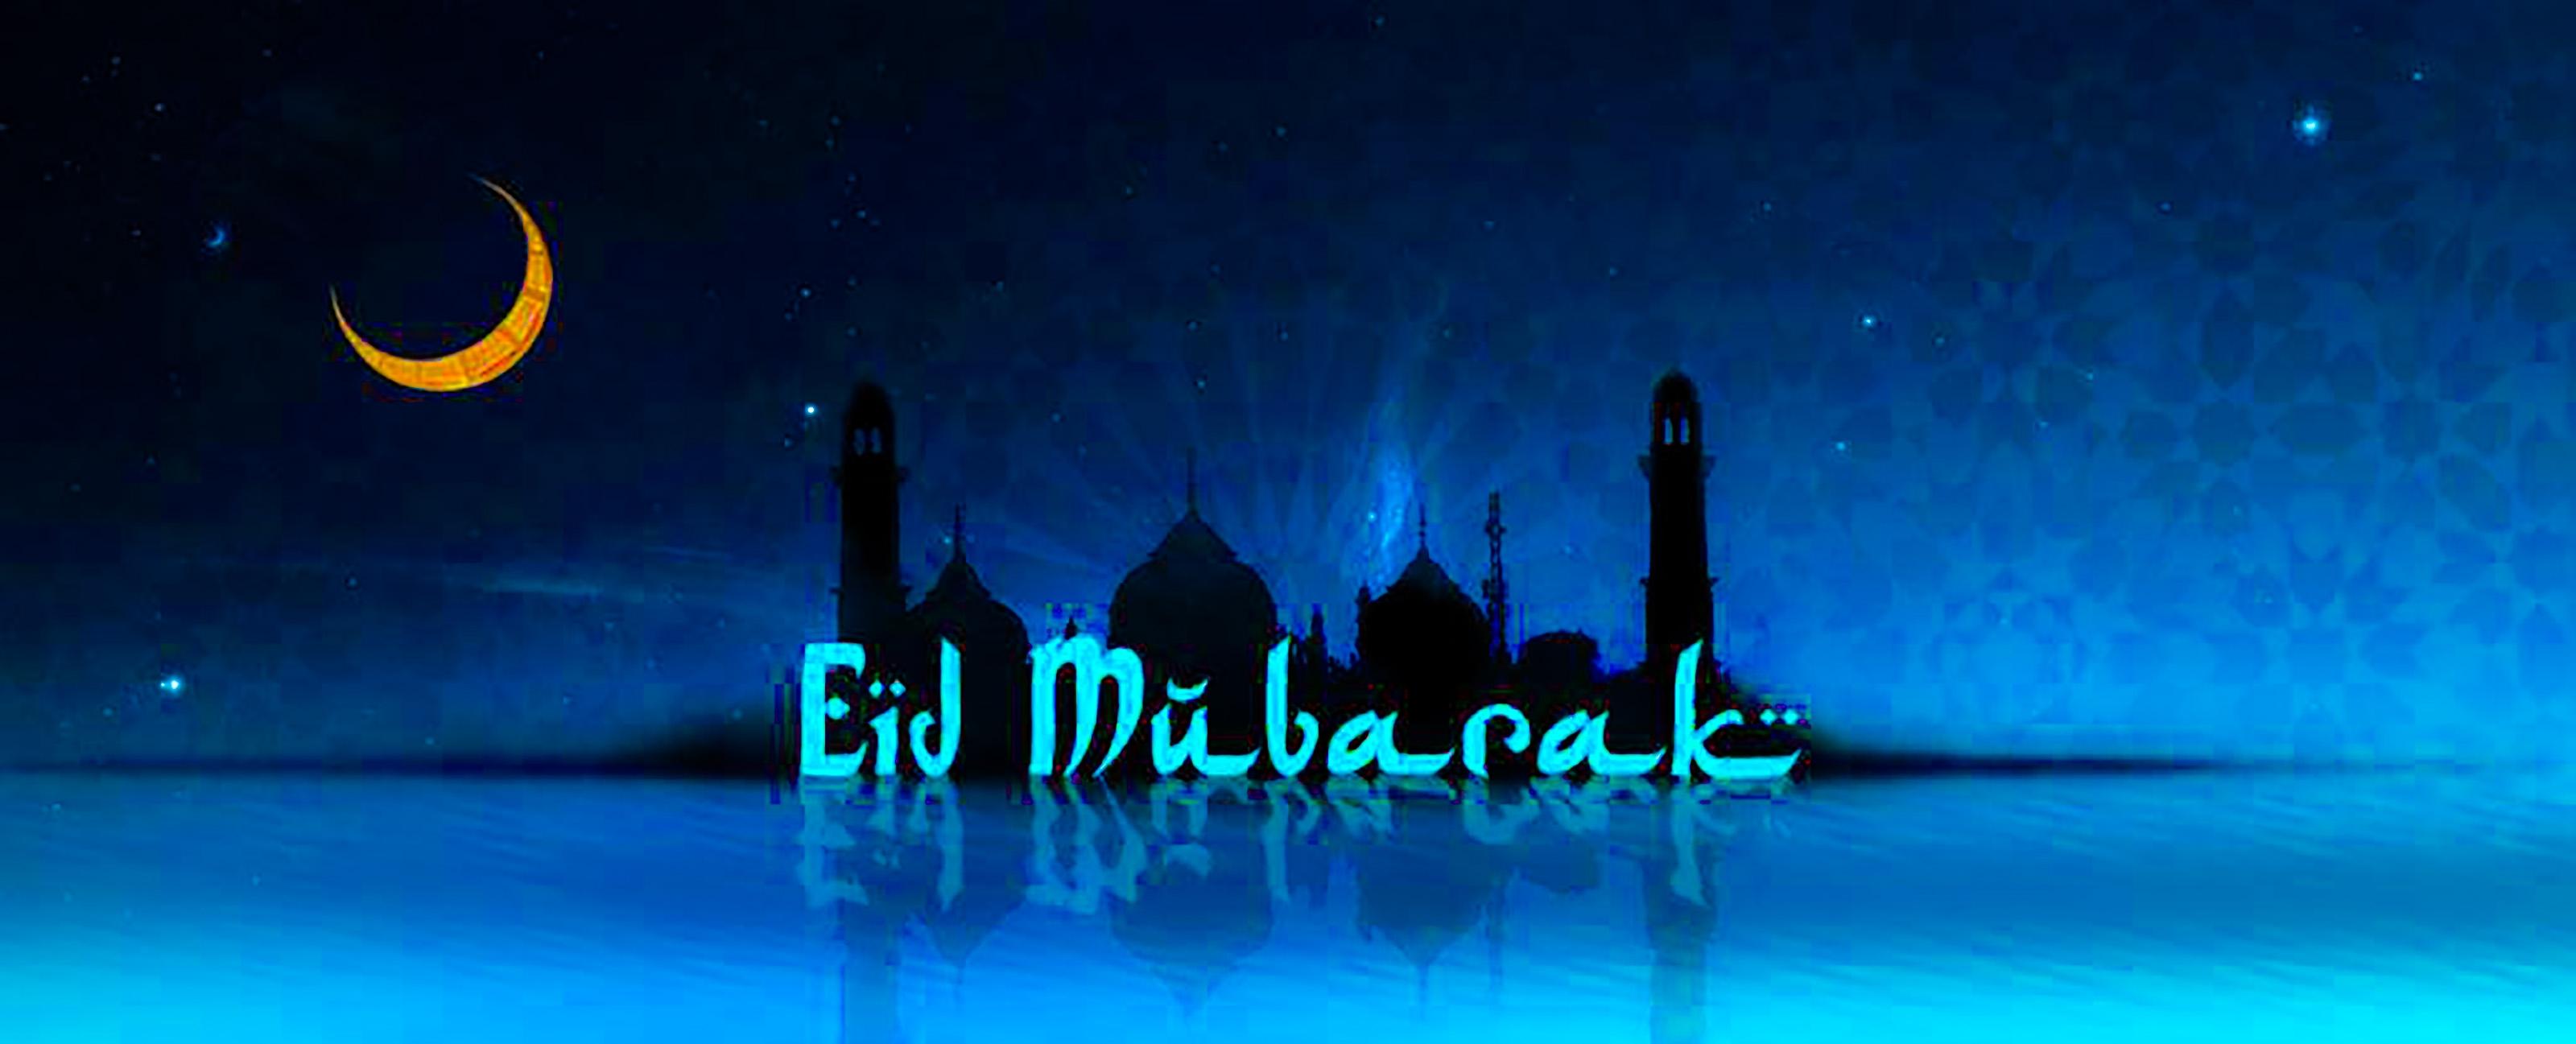 Eid-ul-Fitr celebration begins